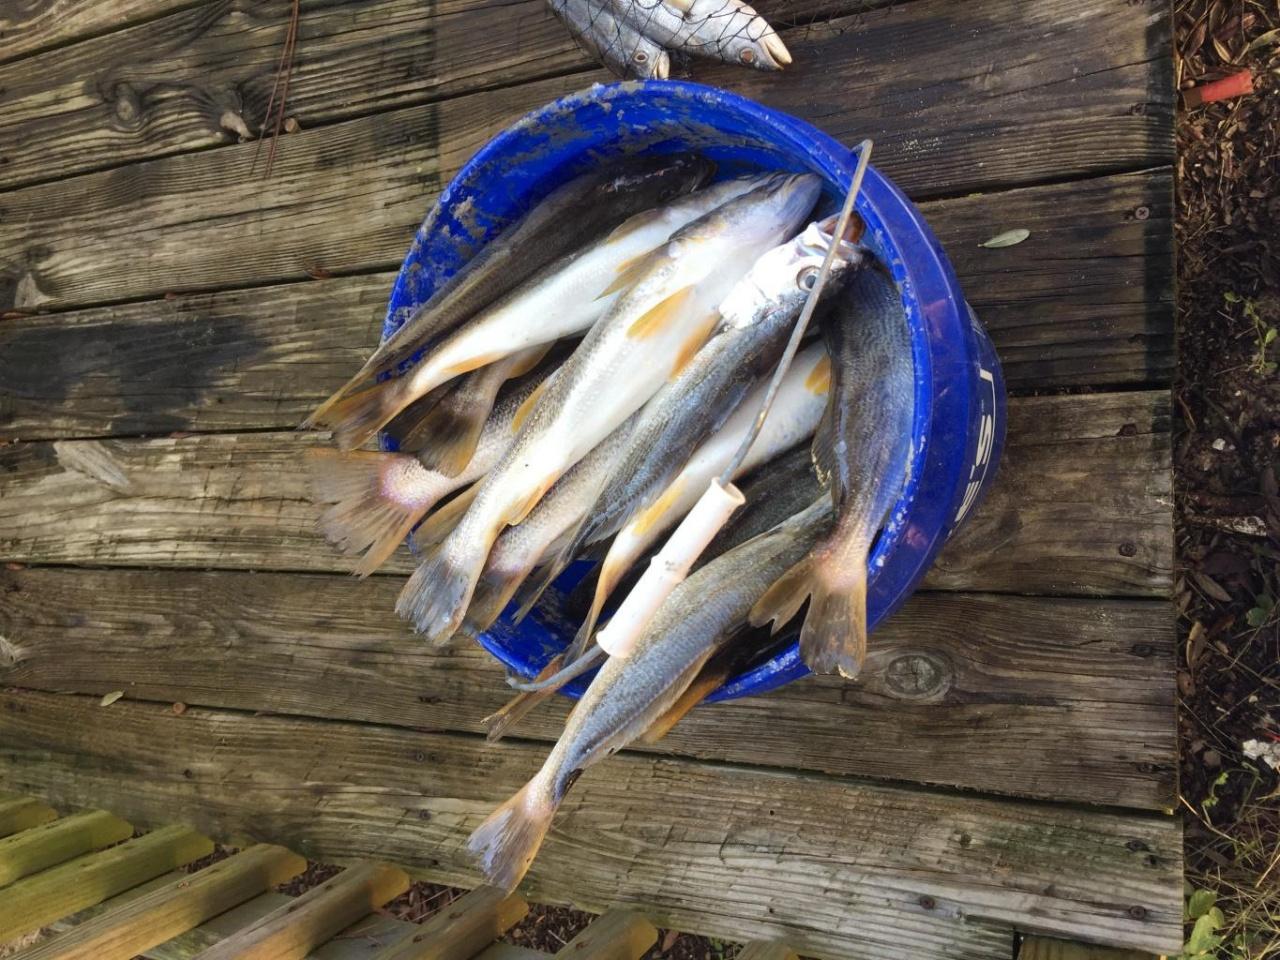 12/3 White trout trip-2a817a35-a34f-4c6f-b7d1-6b9a672c09f0_1543940569126-jpg